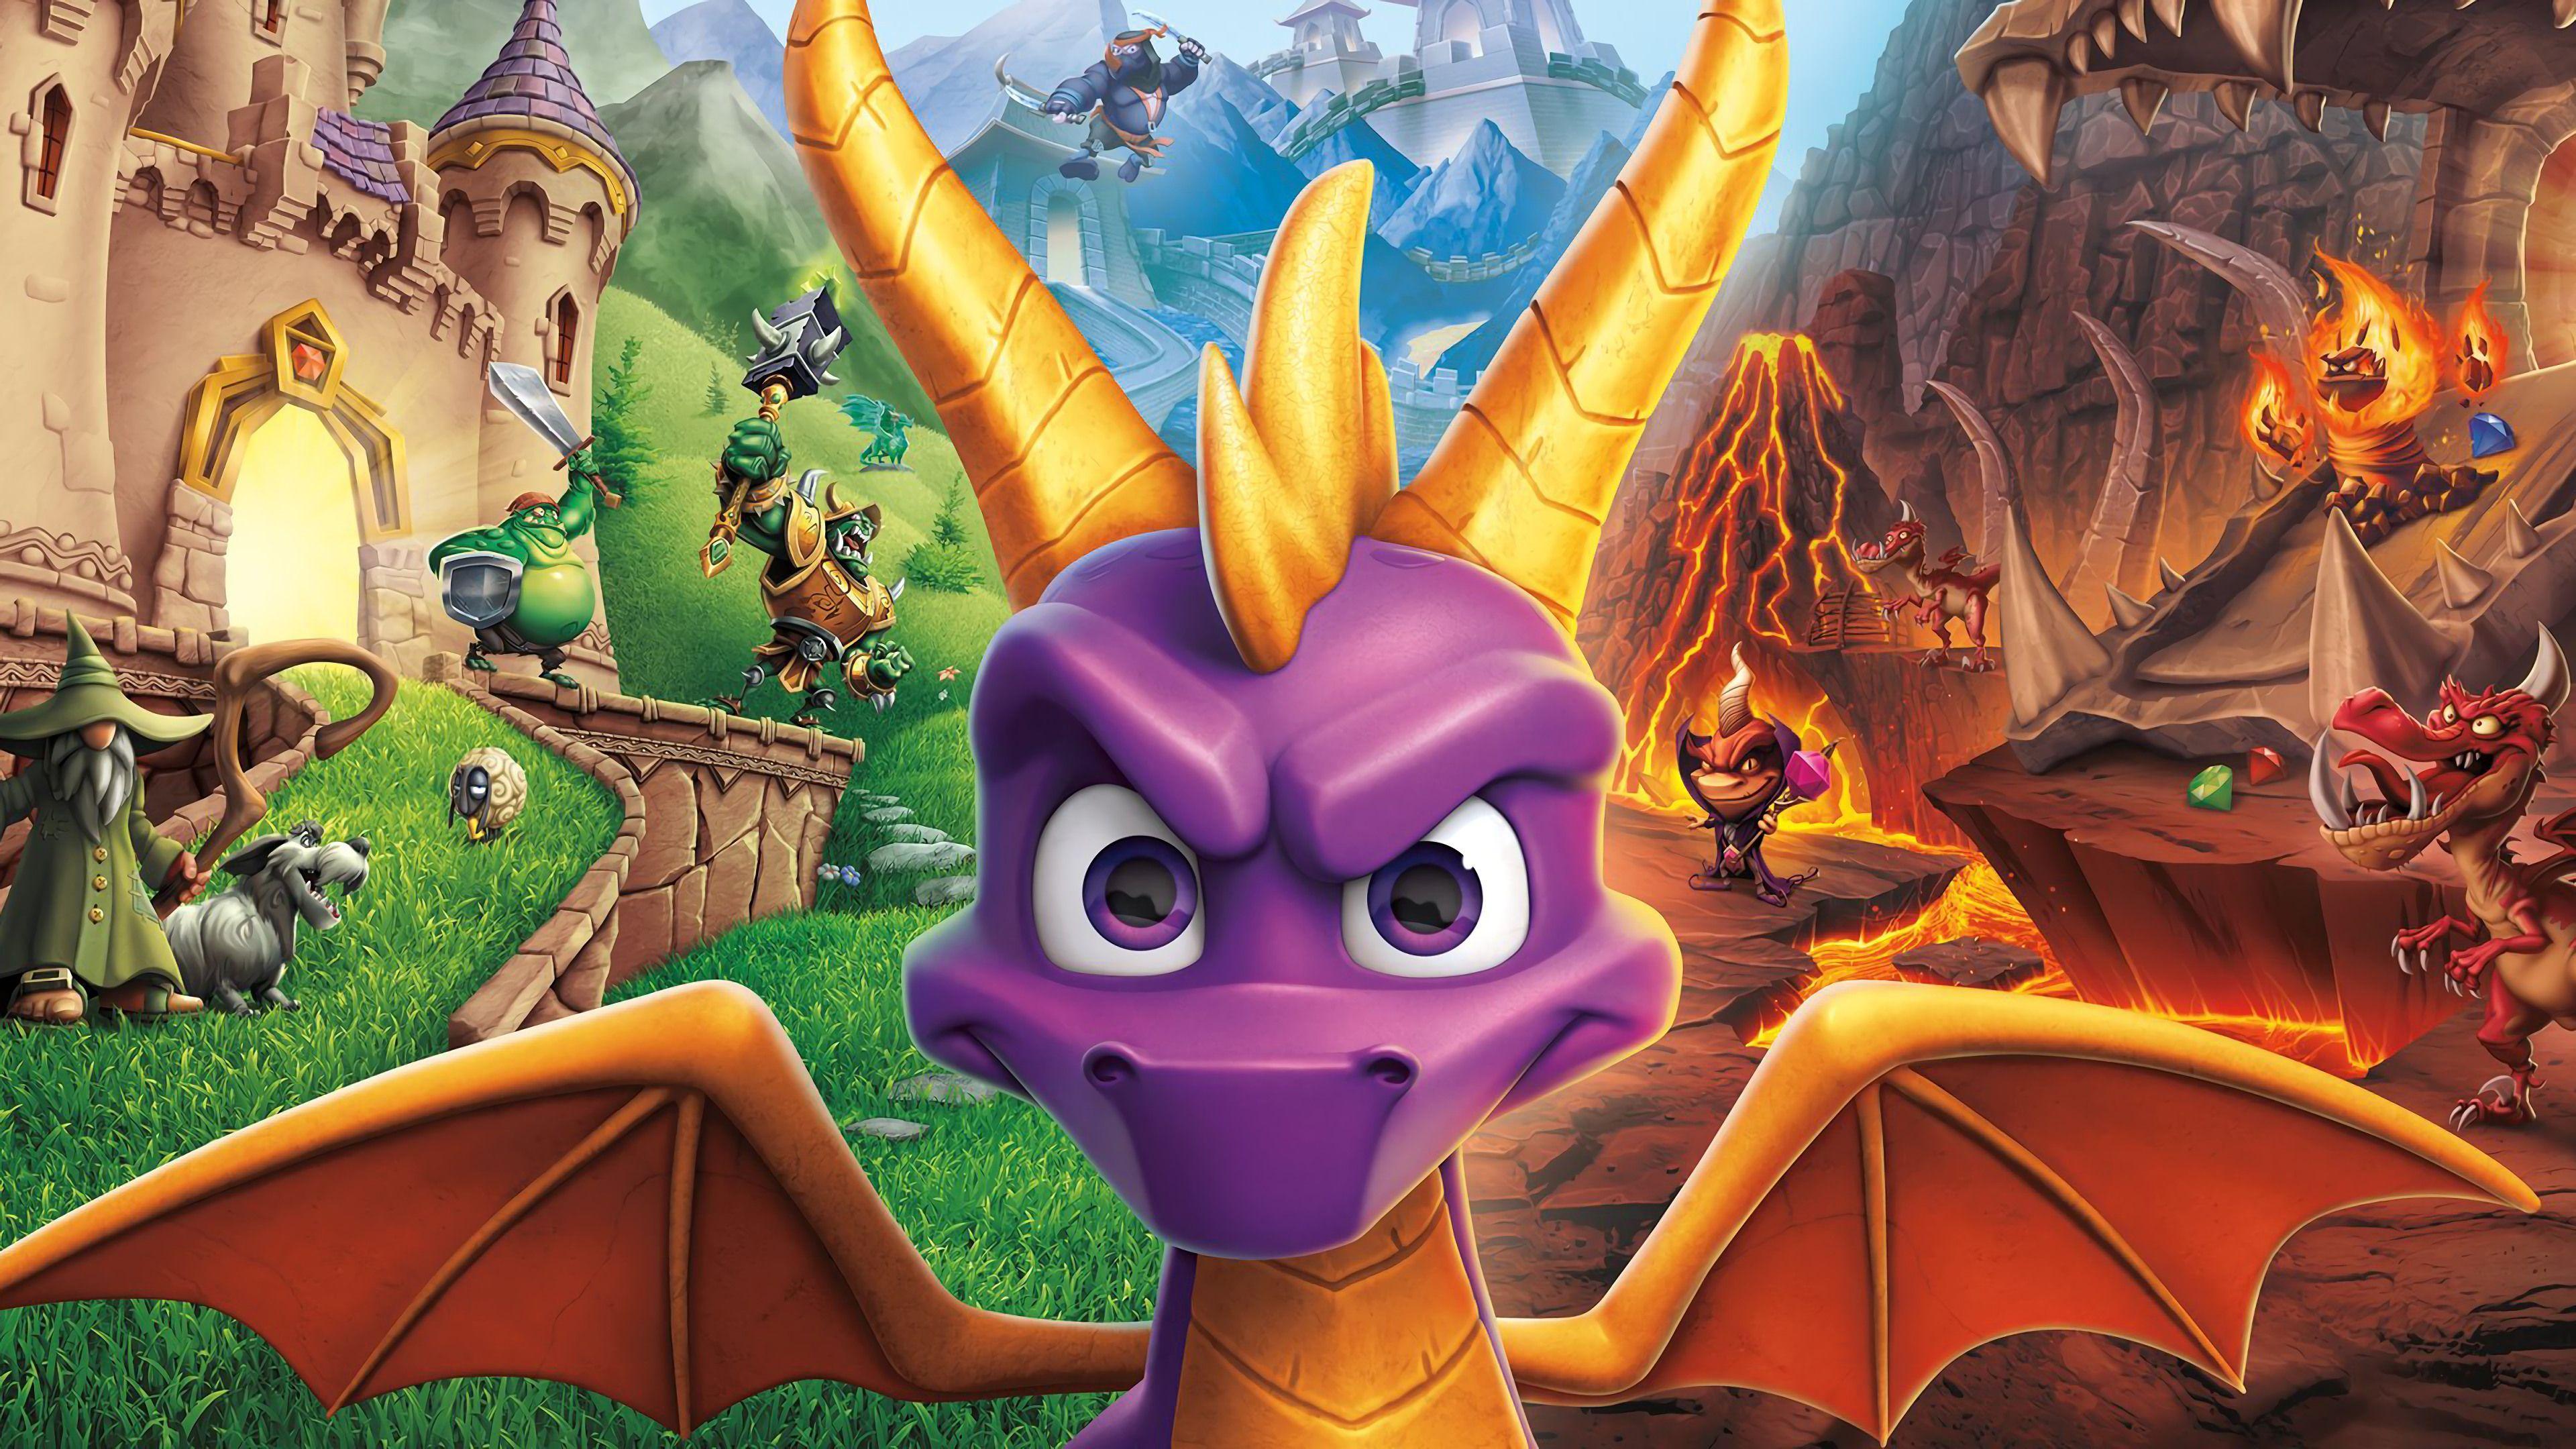 Spyro Screensaver